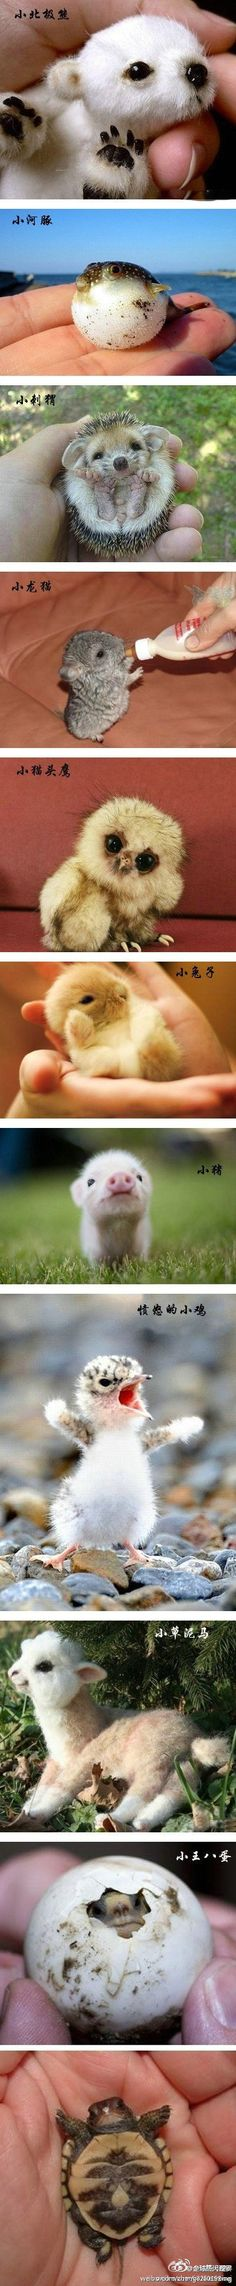 i love baby animals